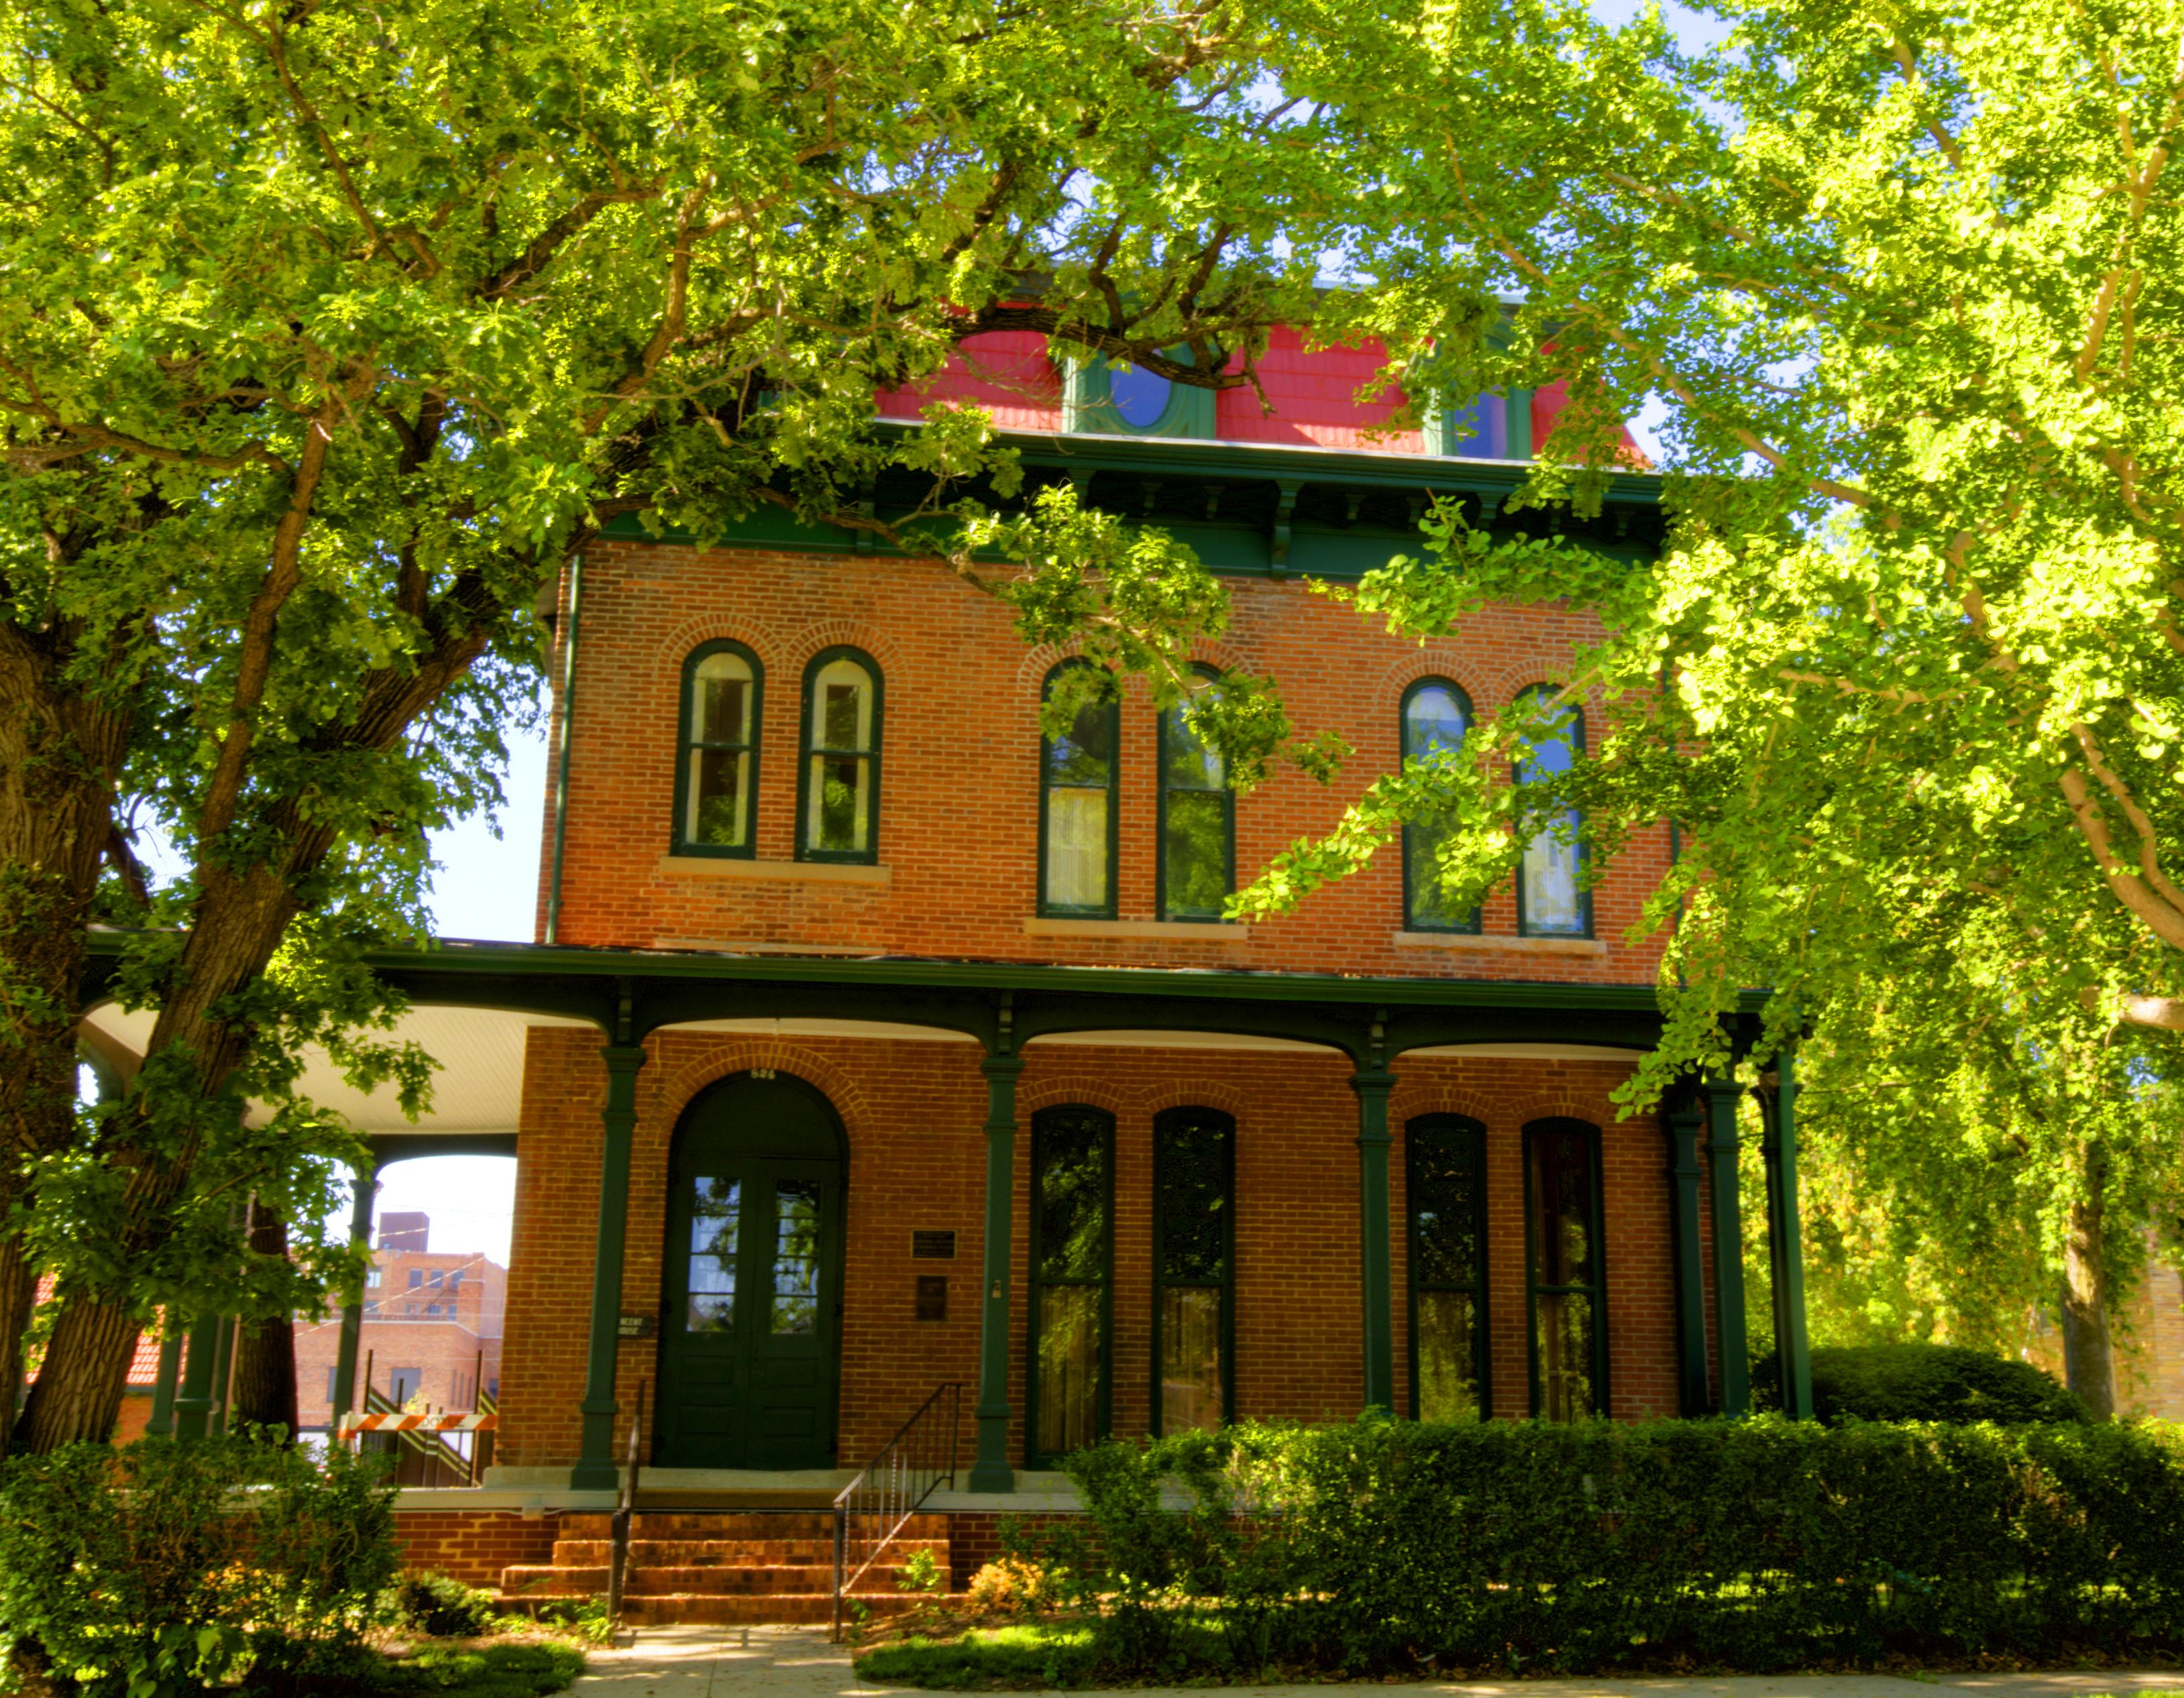 File:Vincent House, Fort Dodge, Iowa.jpg - Wikimedia Commons